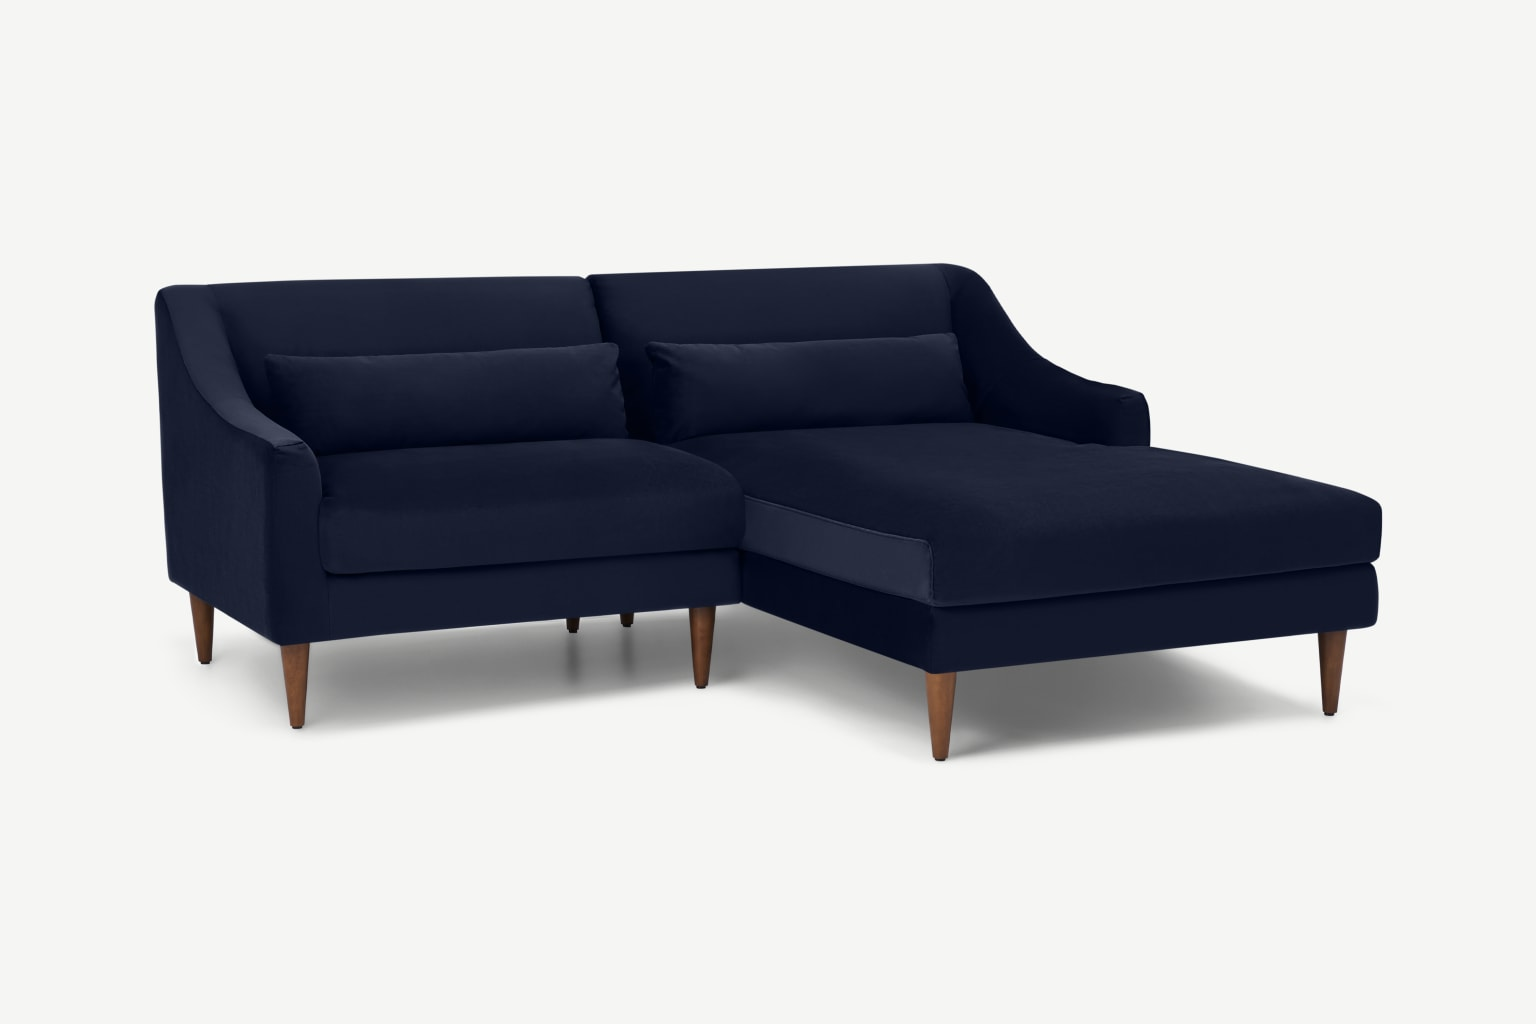 Sofá compacto con chaise longue